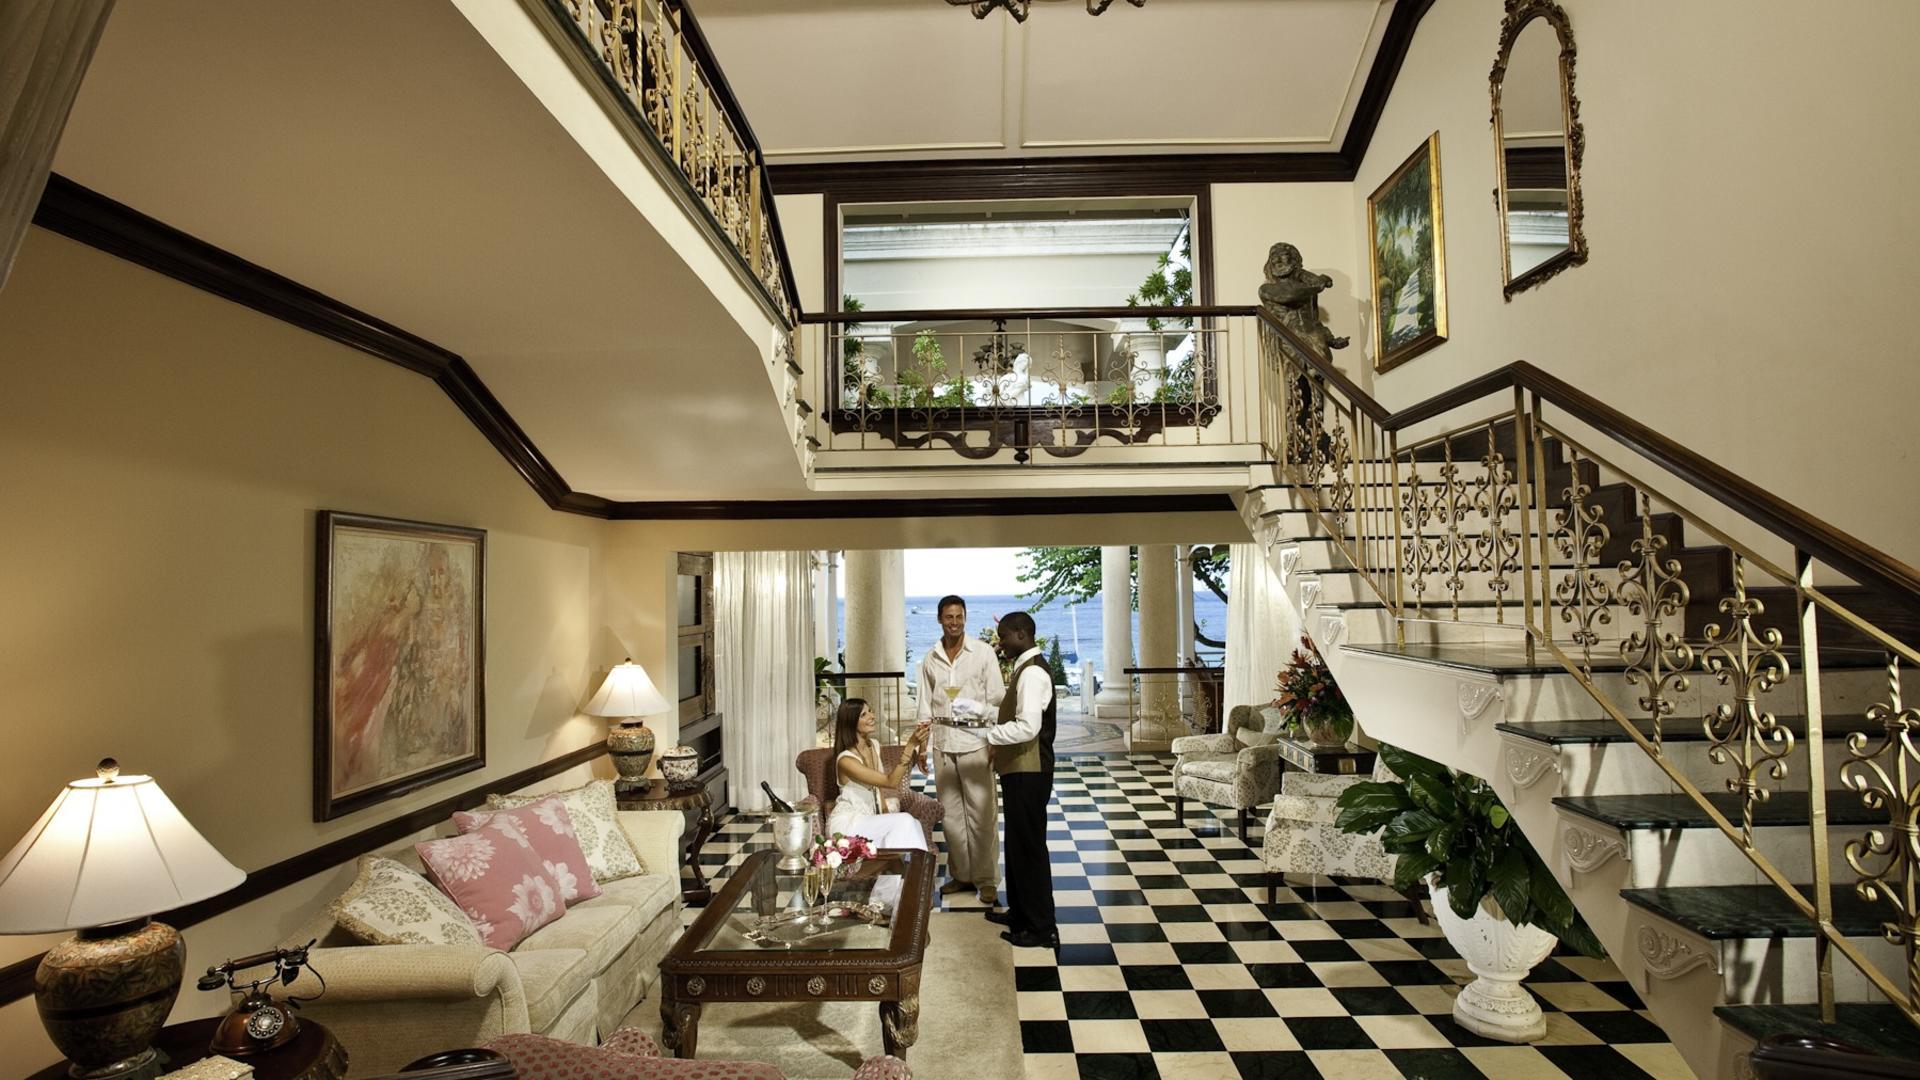 Sandals Royal Plantation Hotel